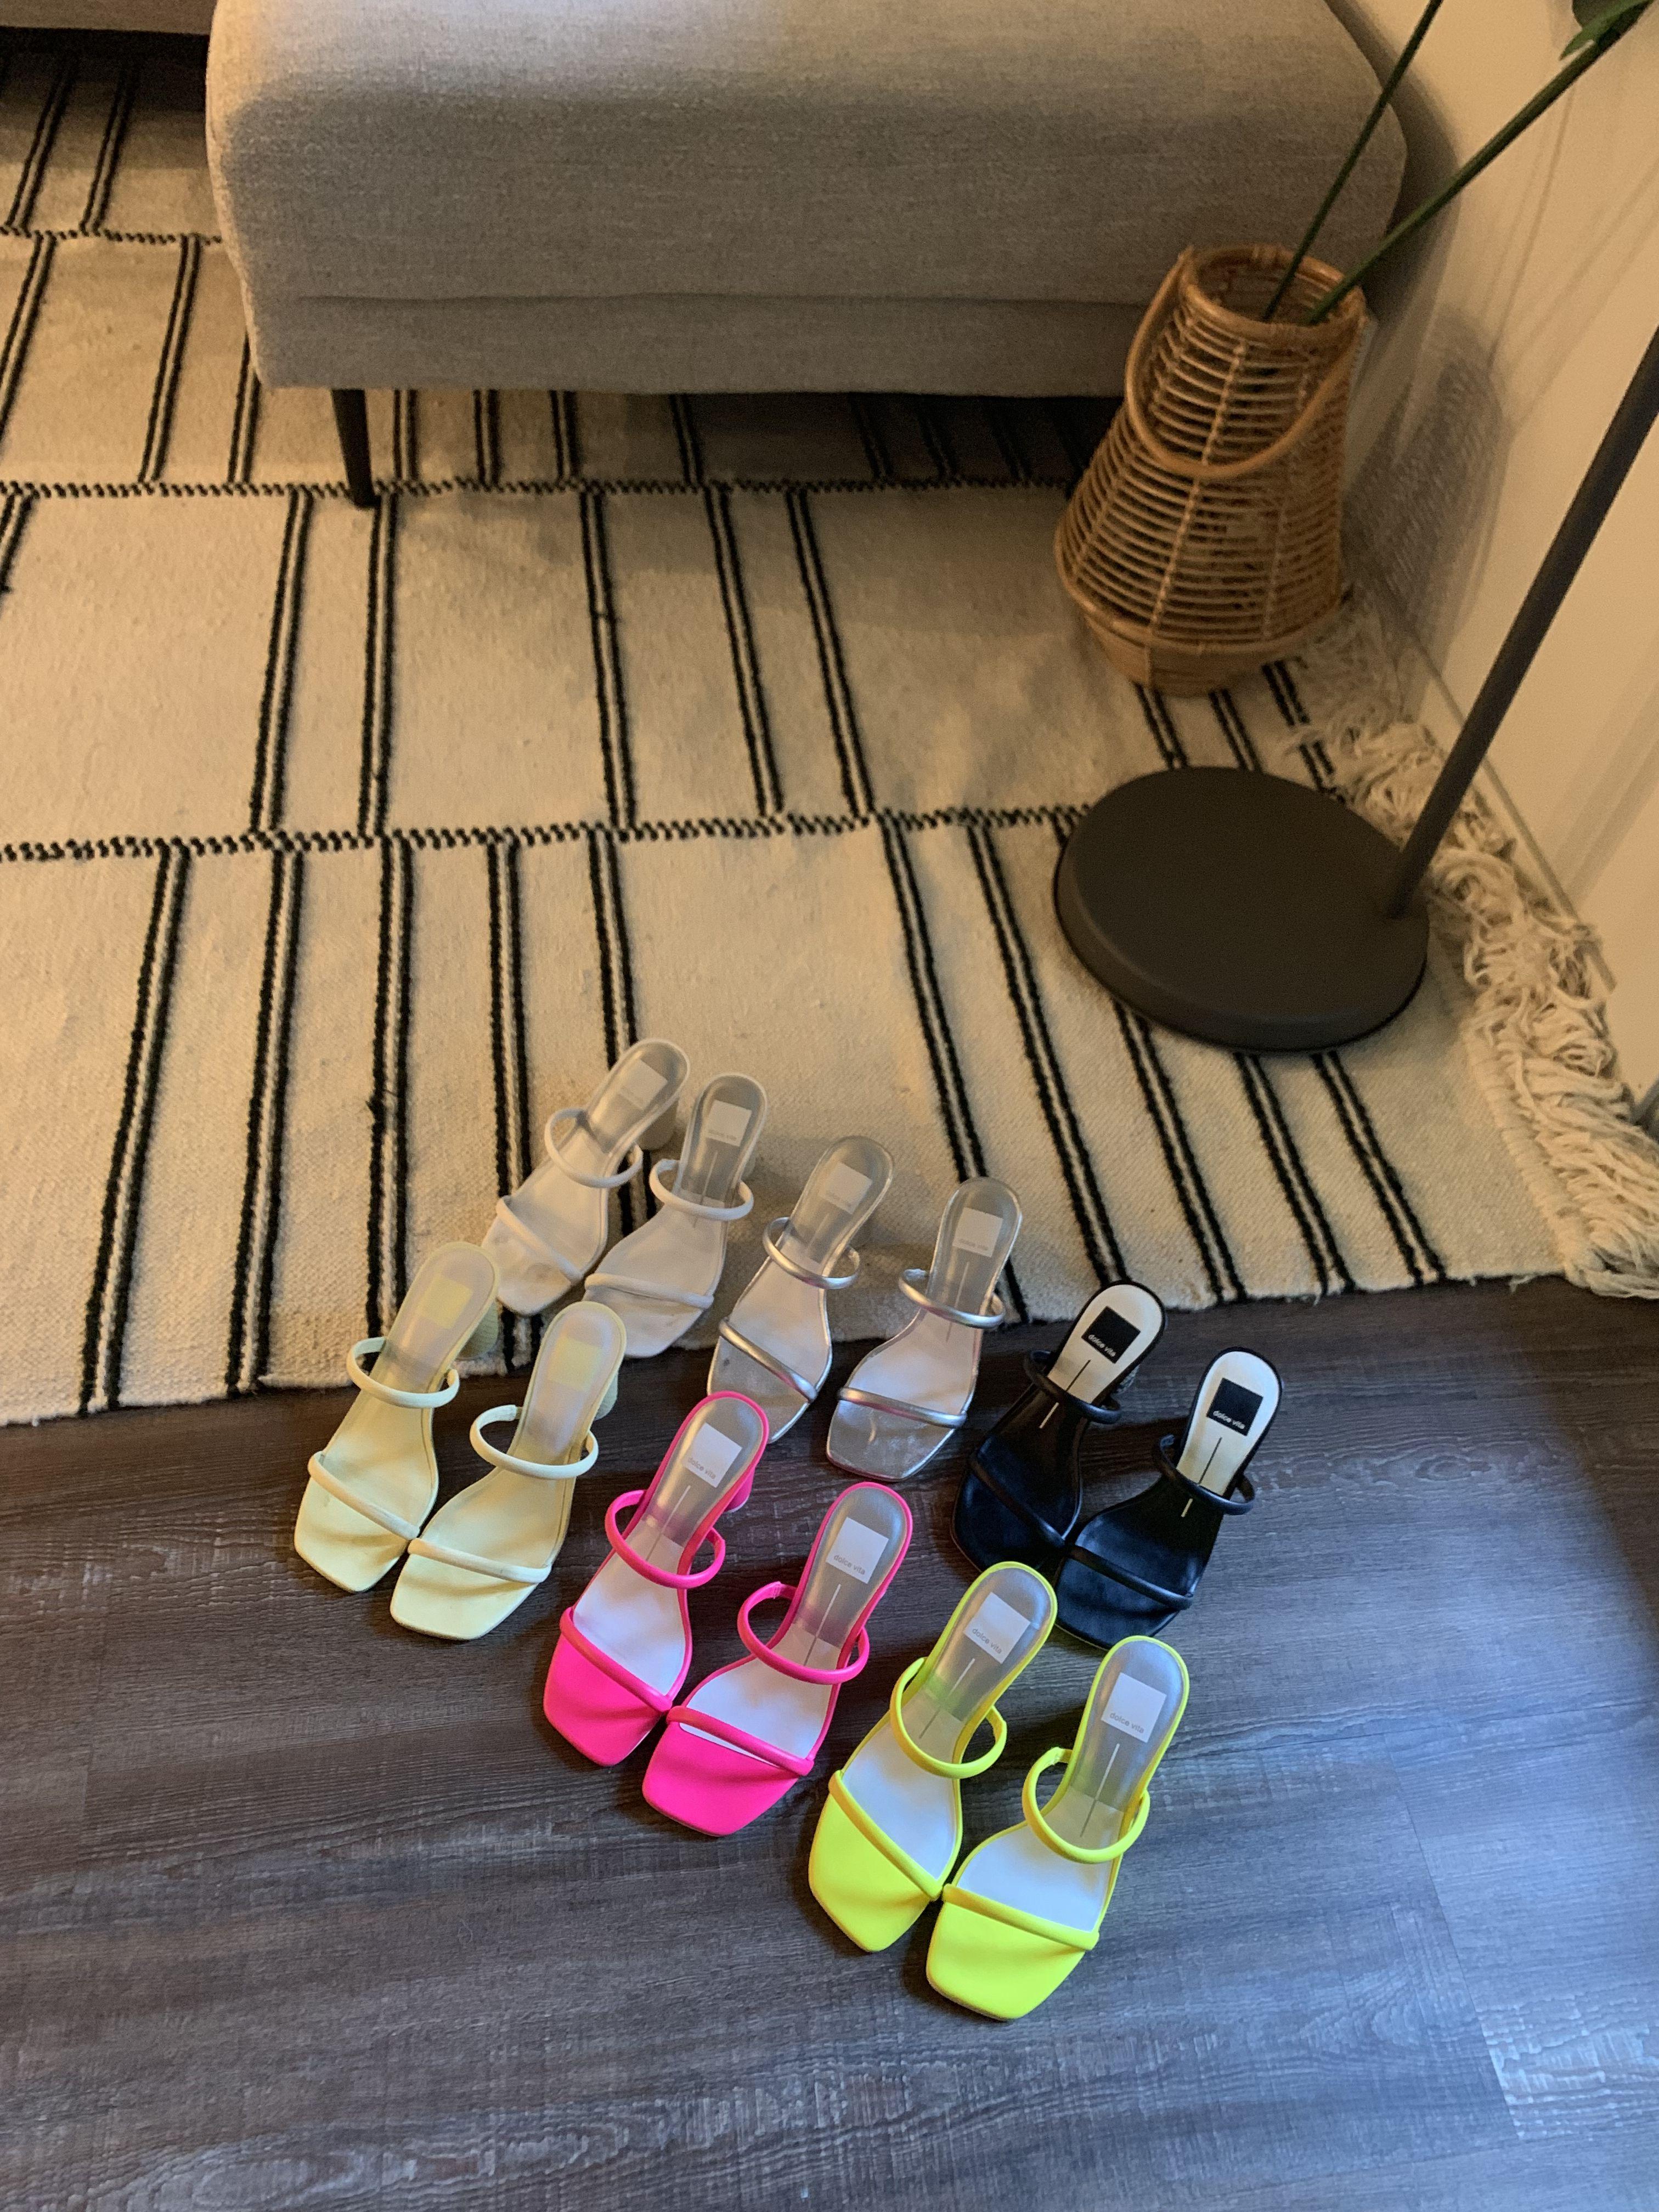 Pin by Bee on footwear in 2020 Nice shoes, Footwear, Shoes